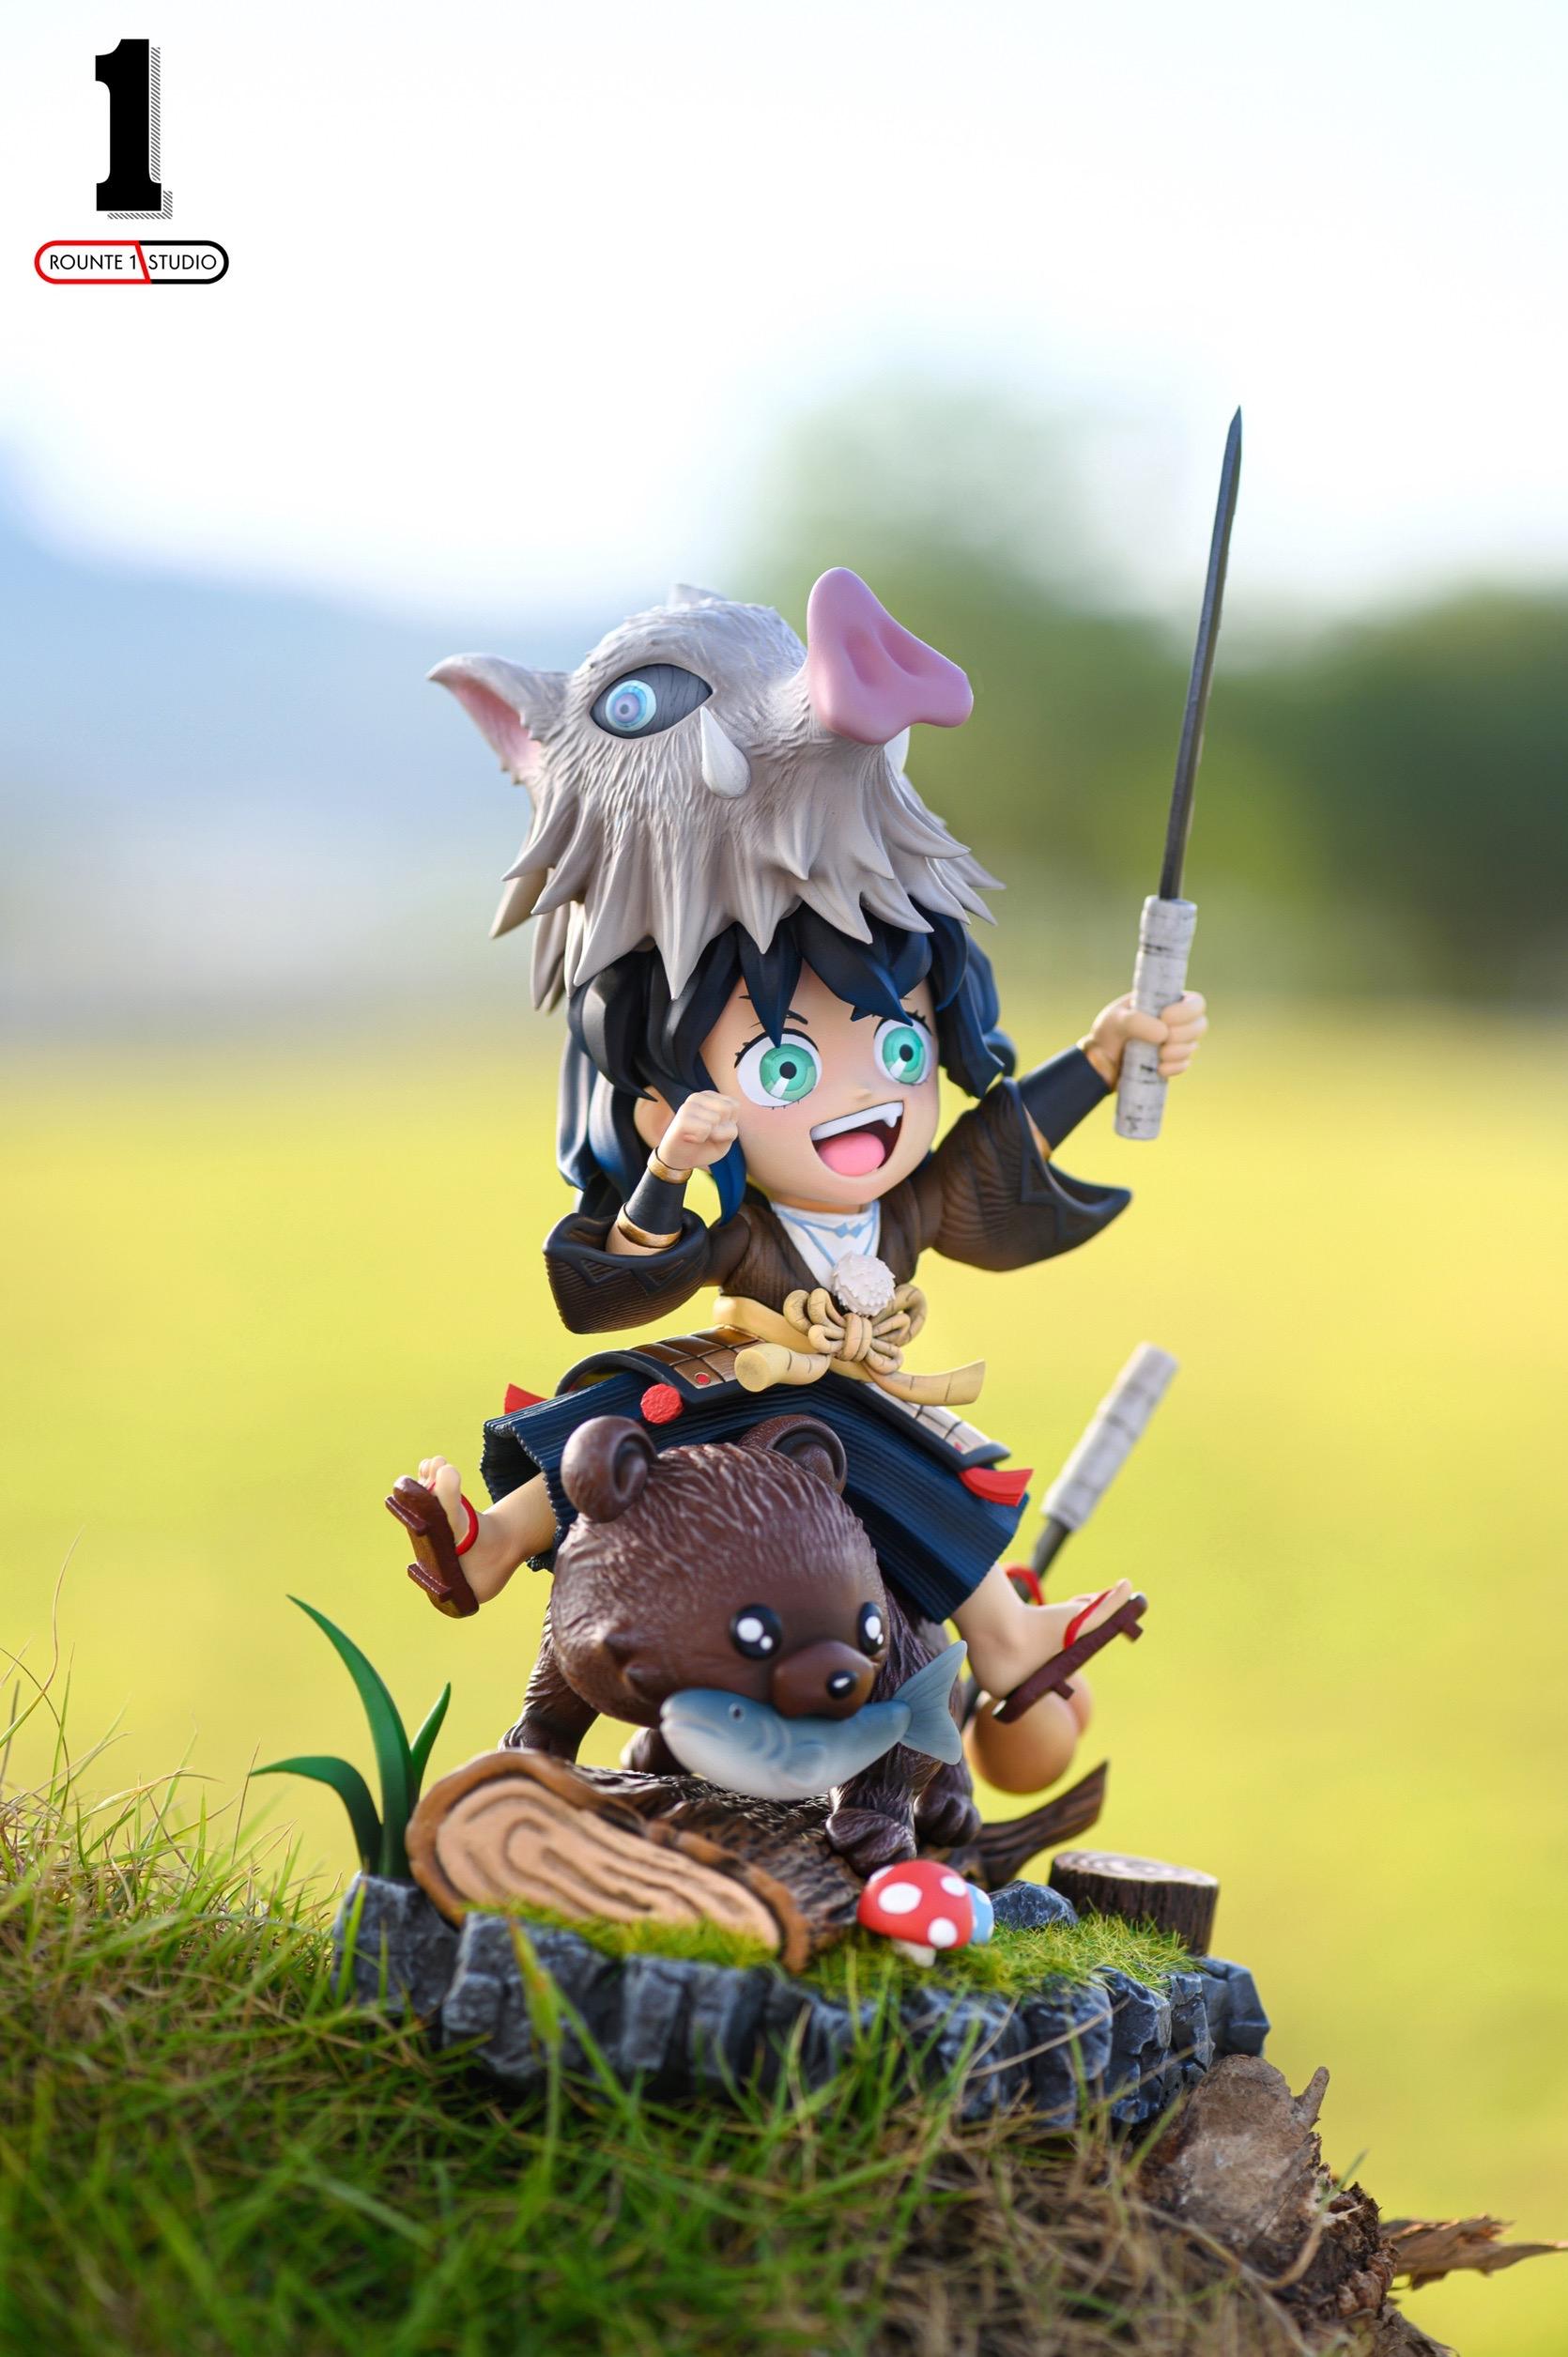 Inosuke อิโนะสุเกะ น้องหมูป่า by OneRoad Studio (มัดจำ)